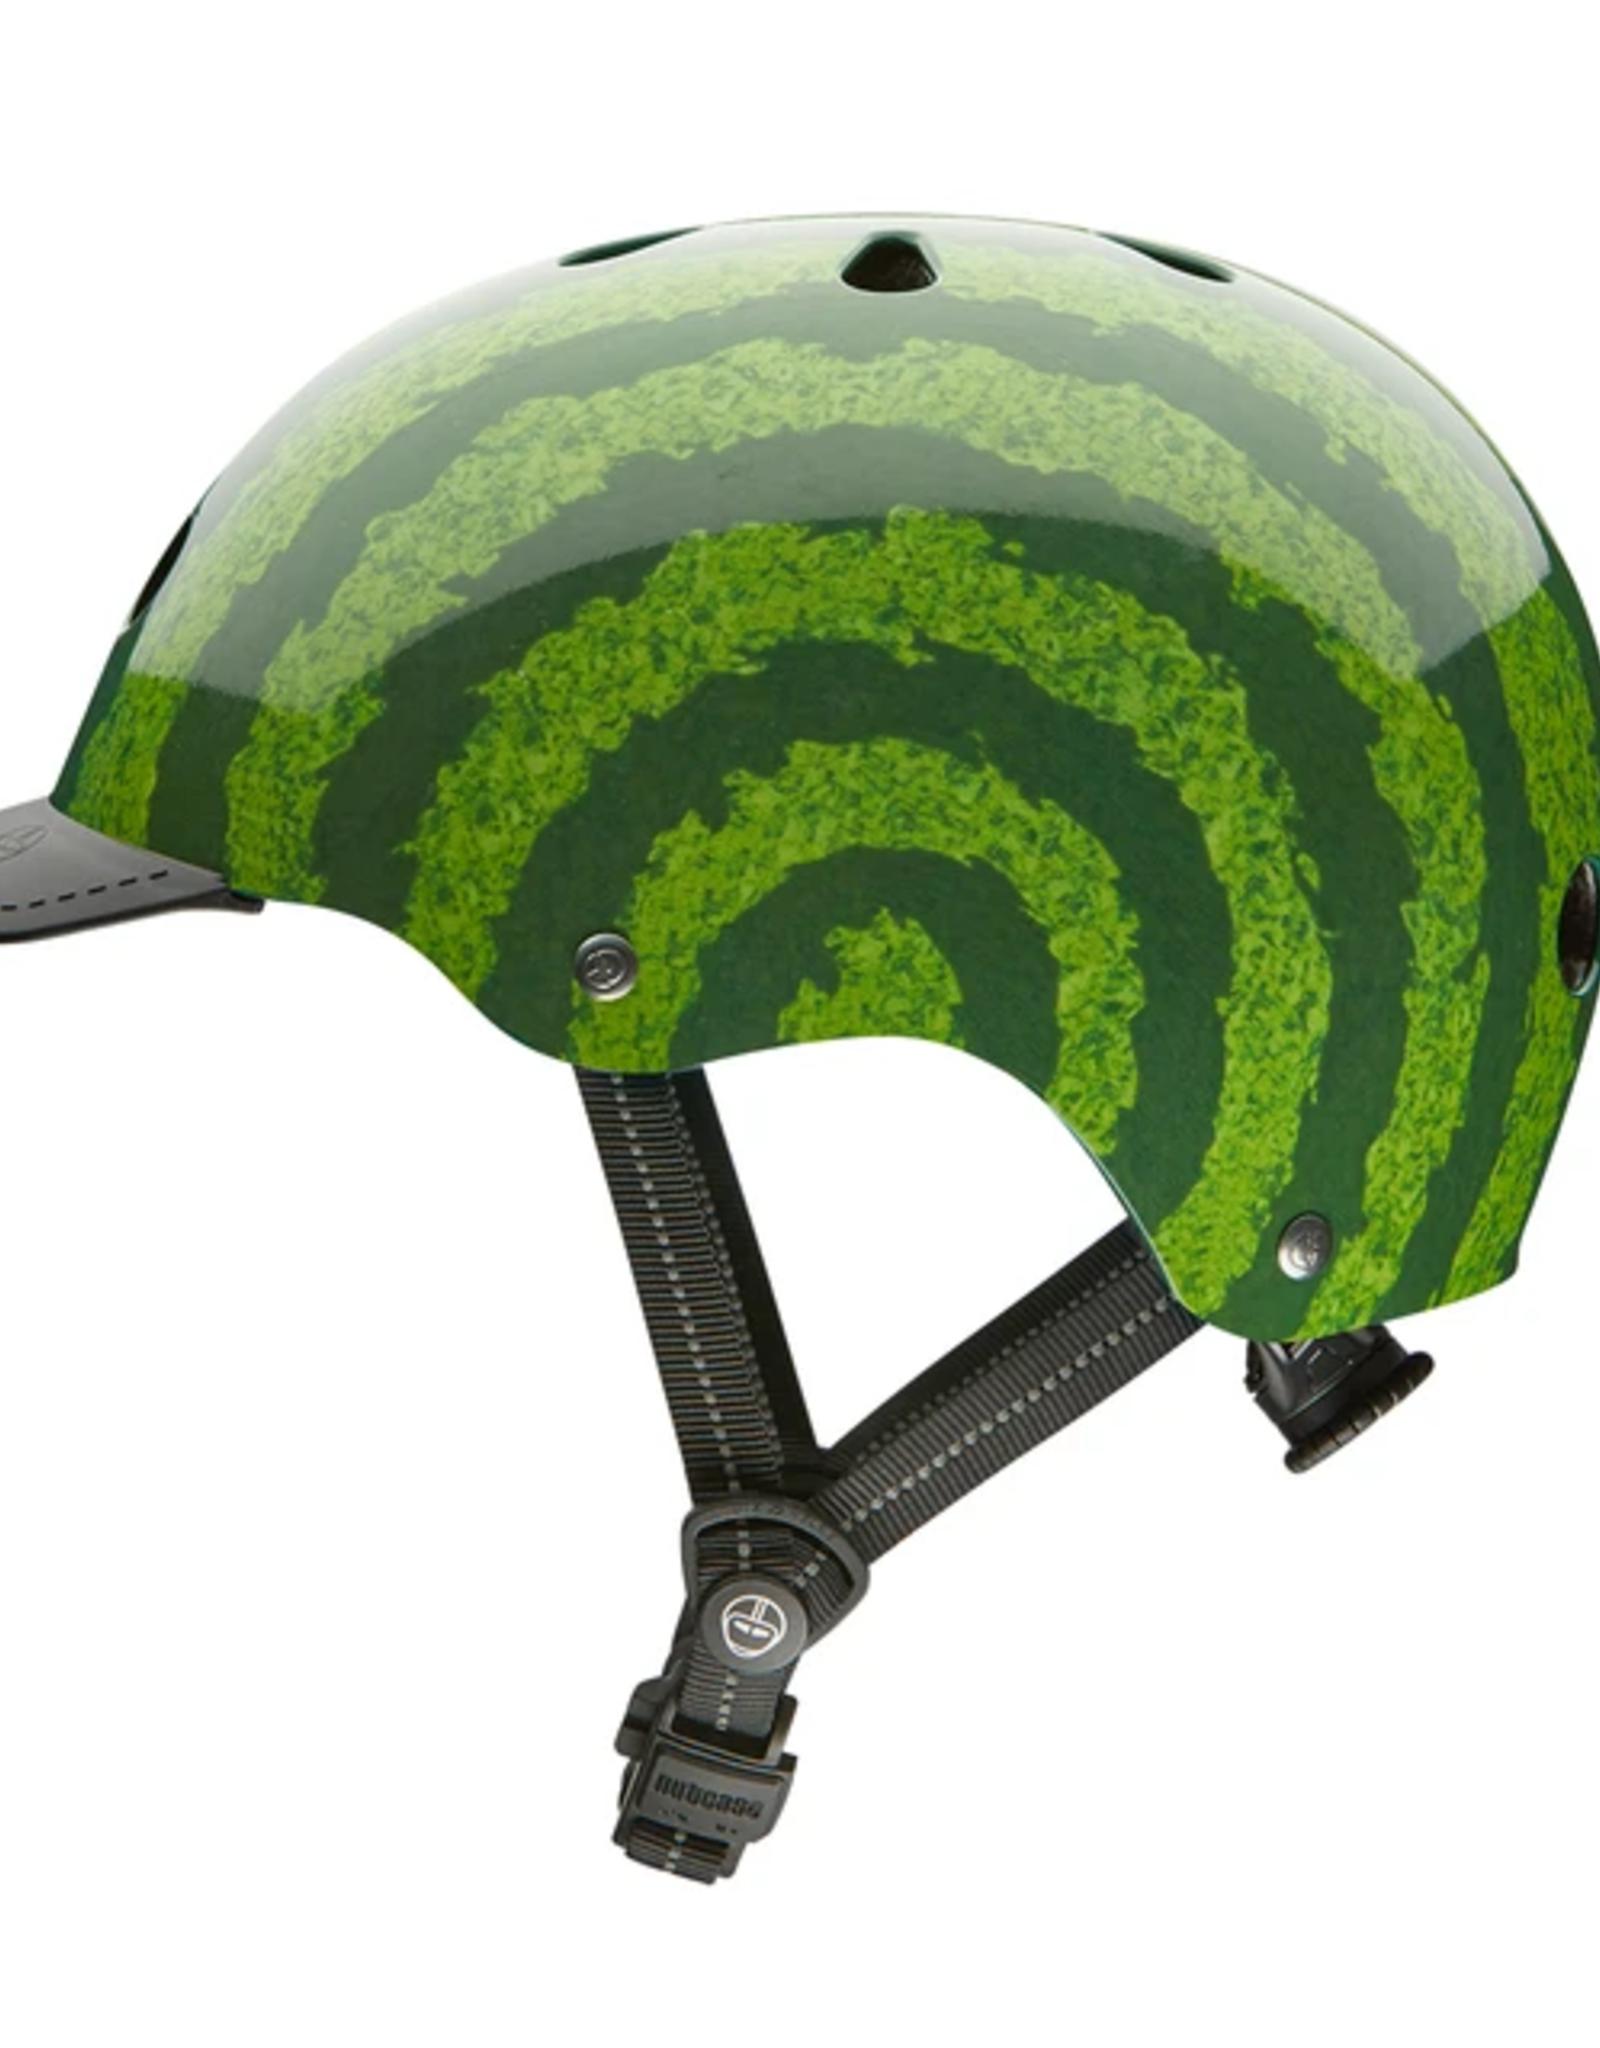 Nutcase Helmet - Nutcase Watermelon Street